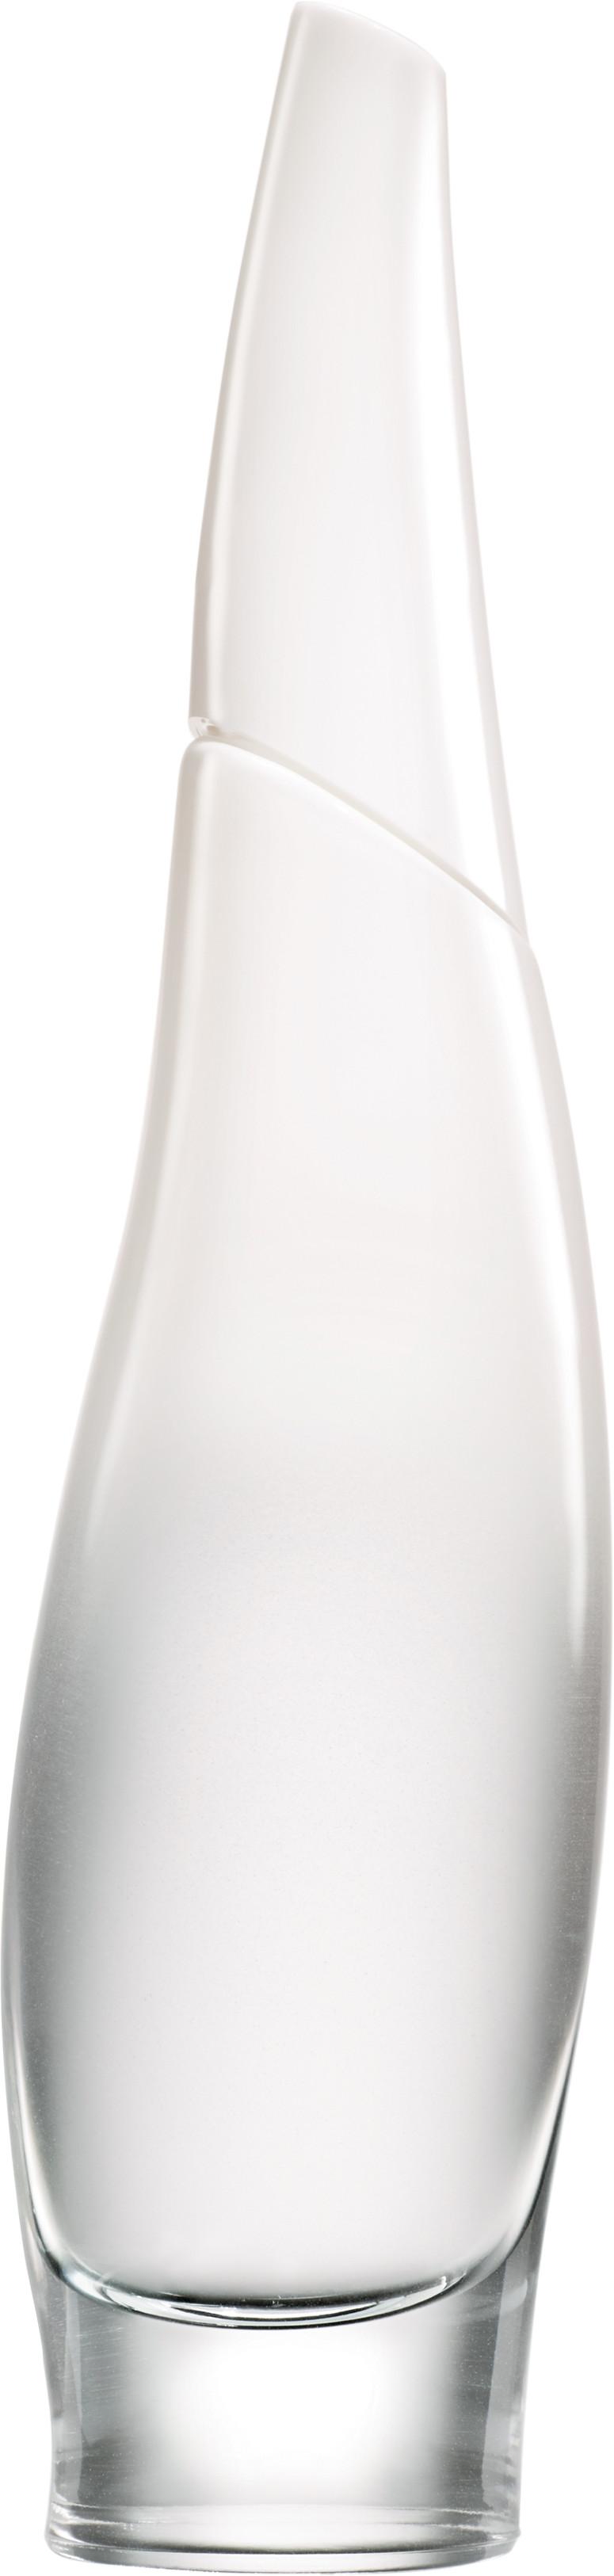 Donna Karan Liquid Cashmere White парфюмированная вода 100мл (Донна Каран Жидкий Белый Кашемир)